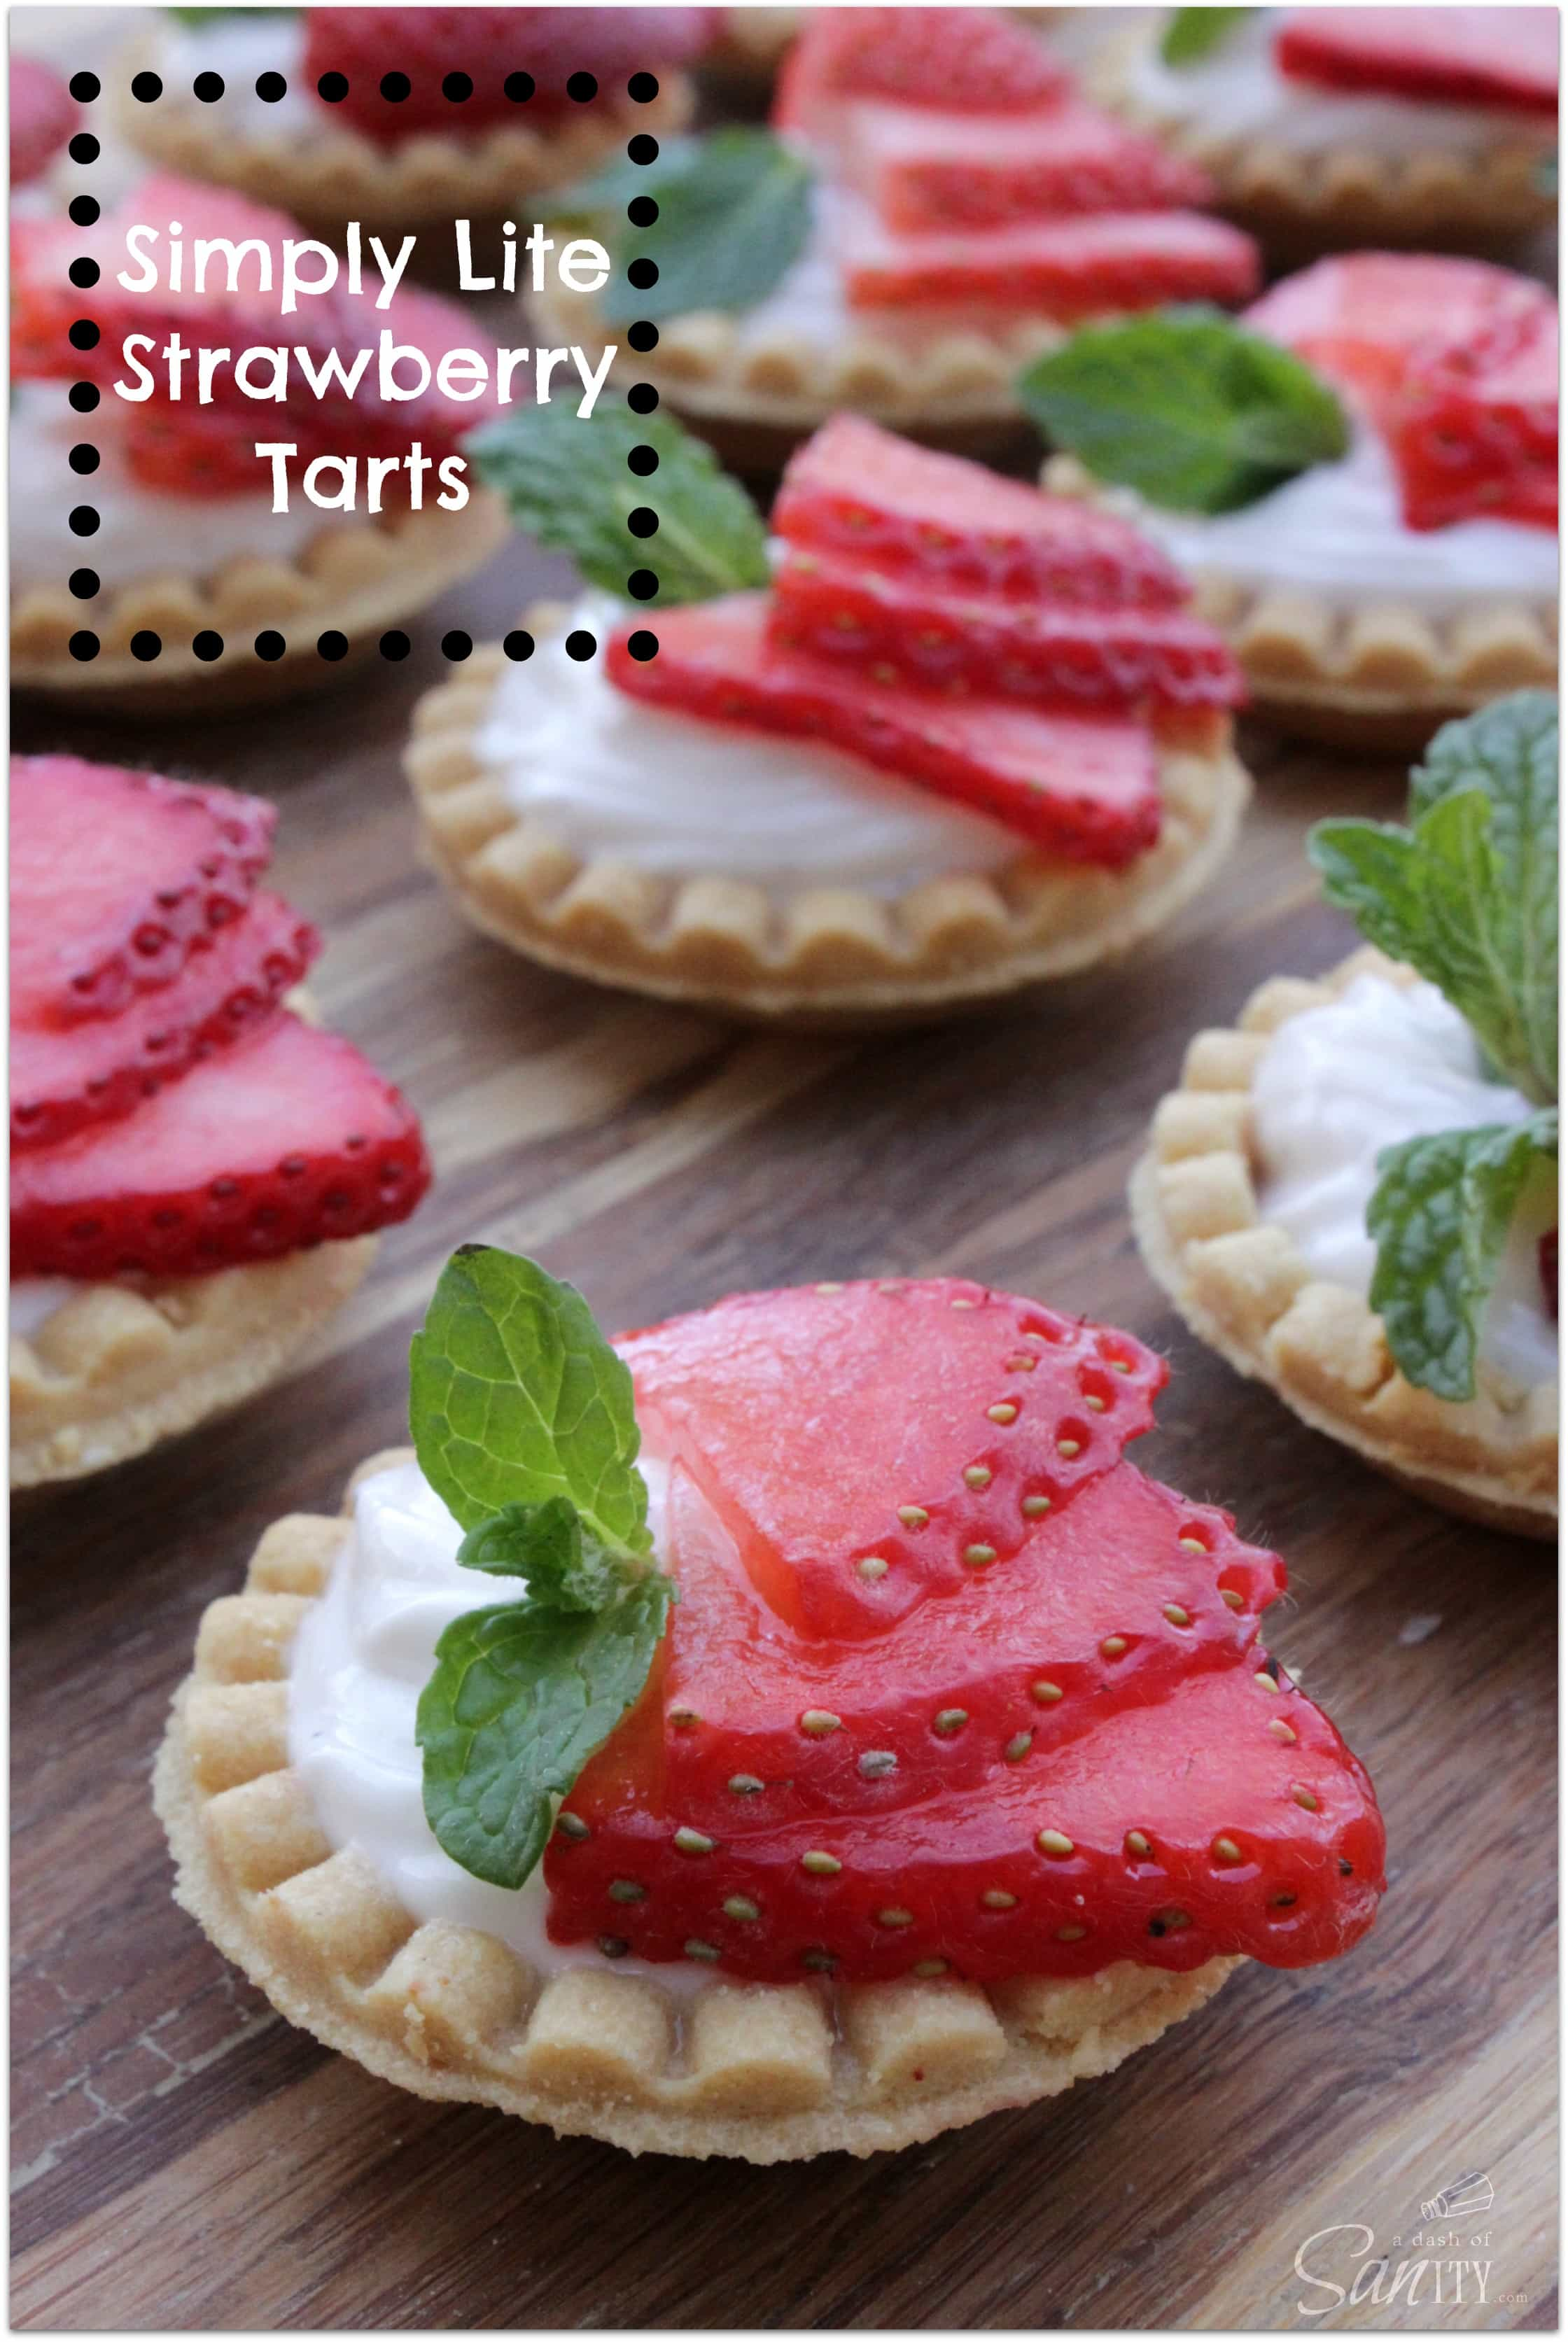 Simply Lite Strawberry Tarts